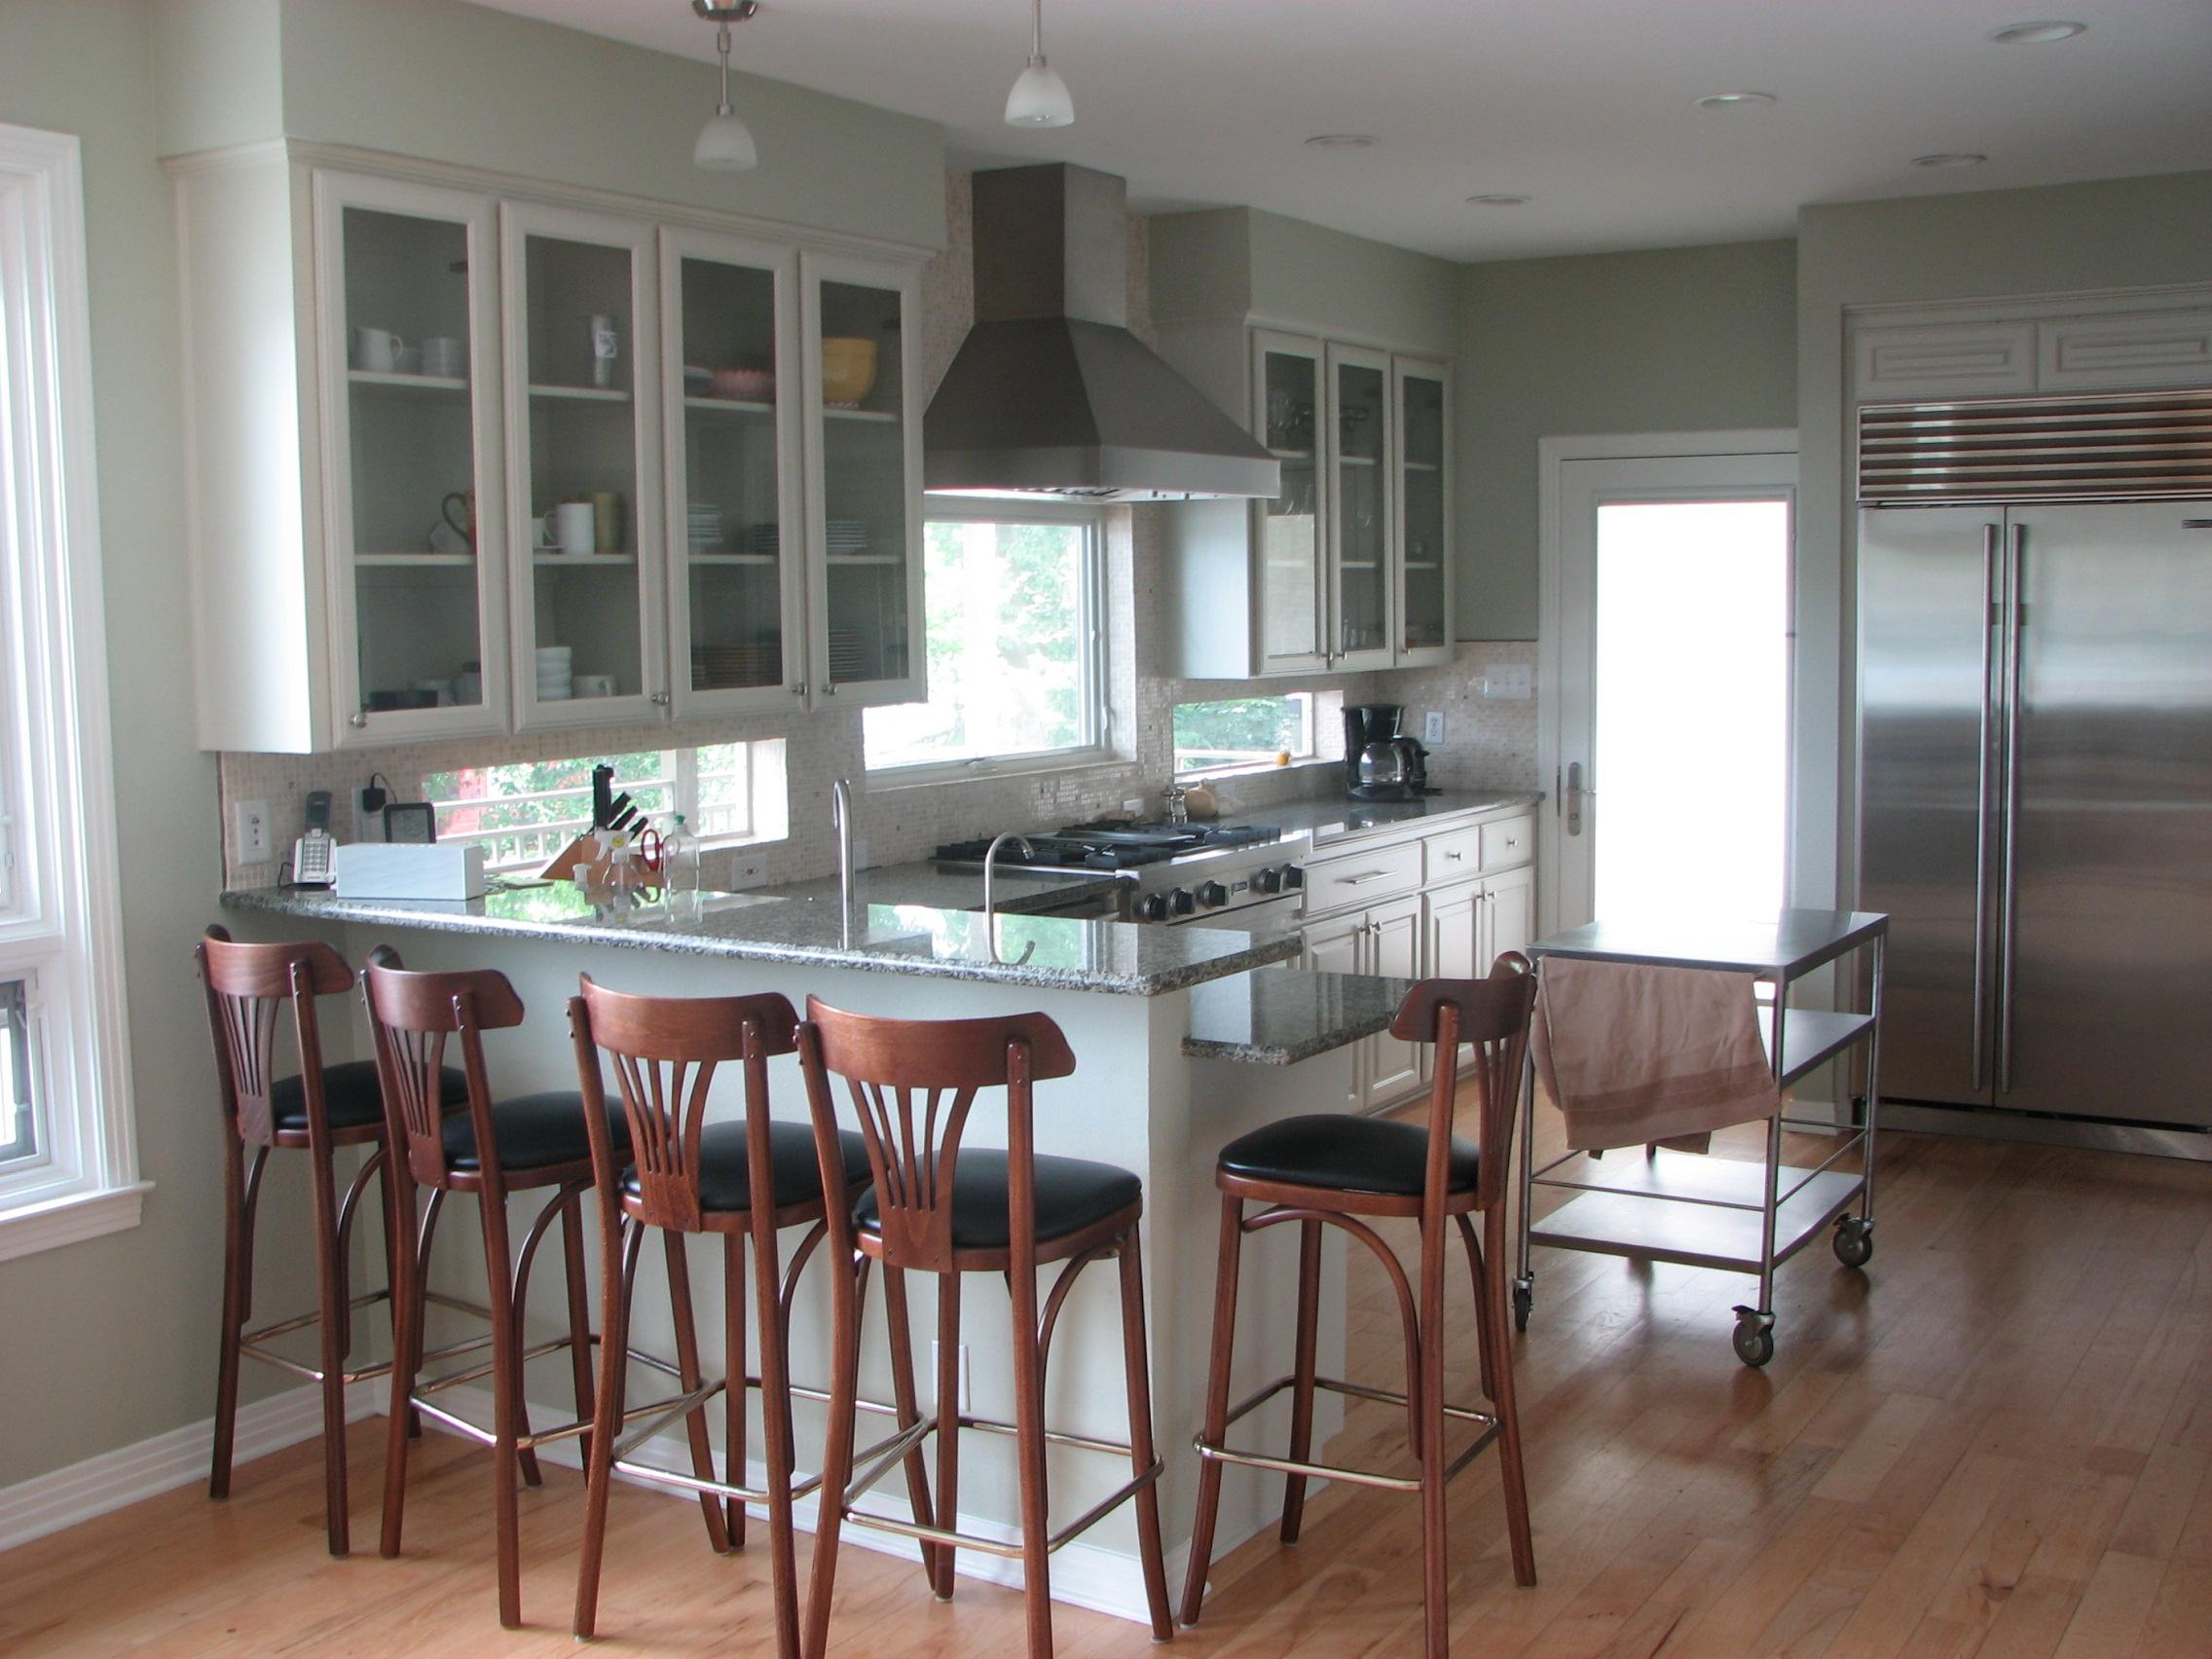 kitchen makeovers austin texas. Black Bedroom Furniture Sets. Home Design Ideas